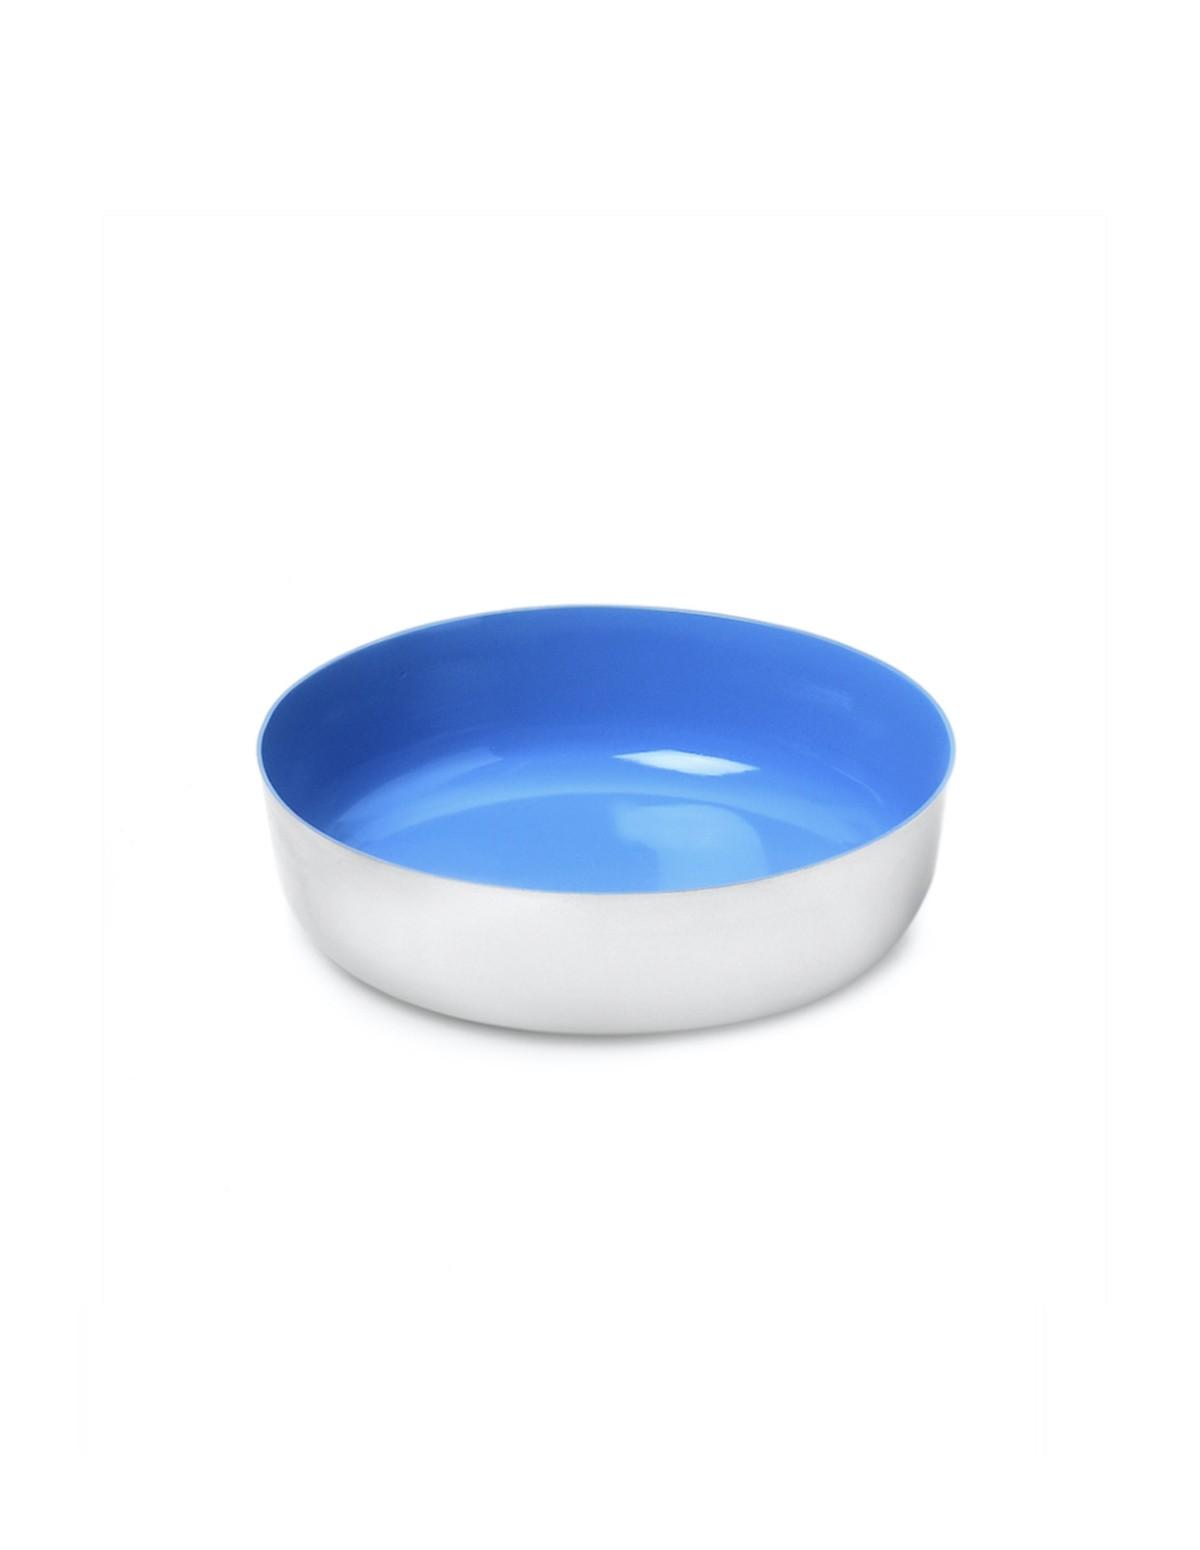 Ichendorf Trino Bowl 14 Cm - LIGHT BLUE